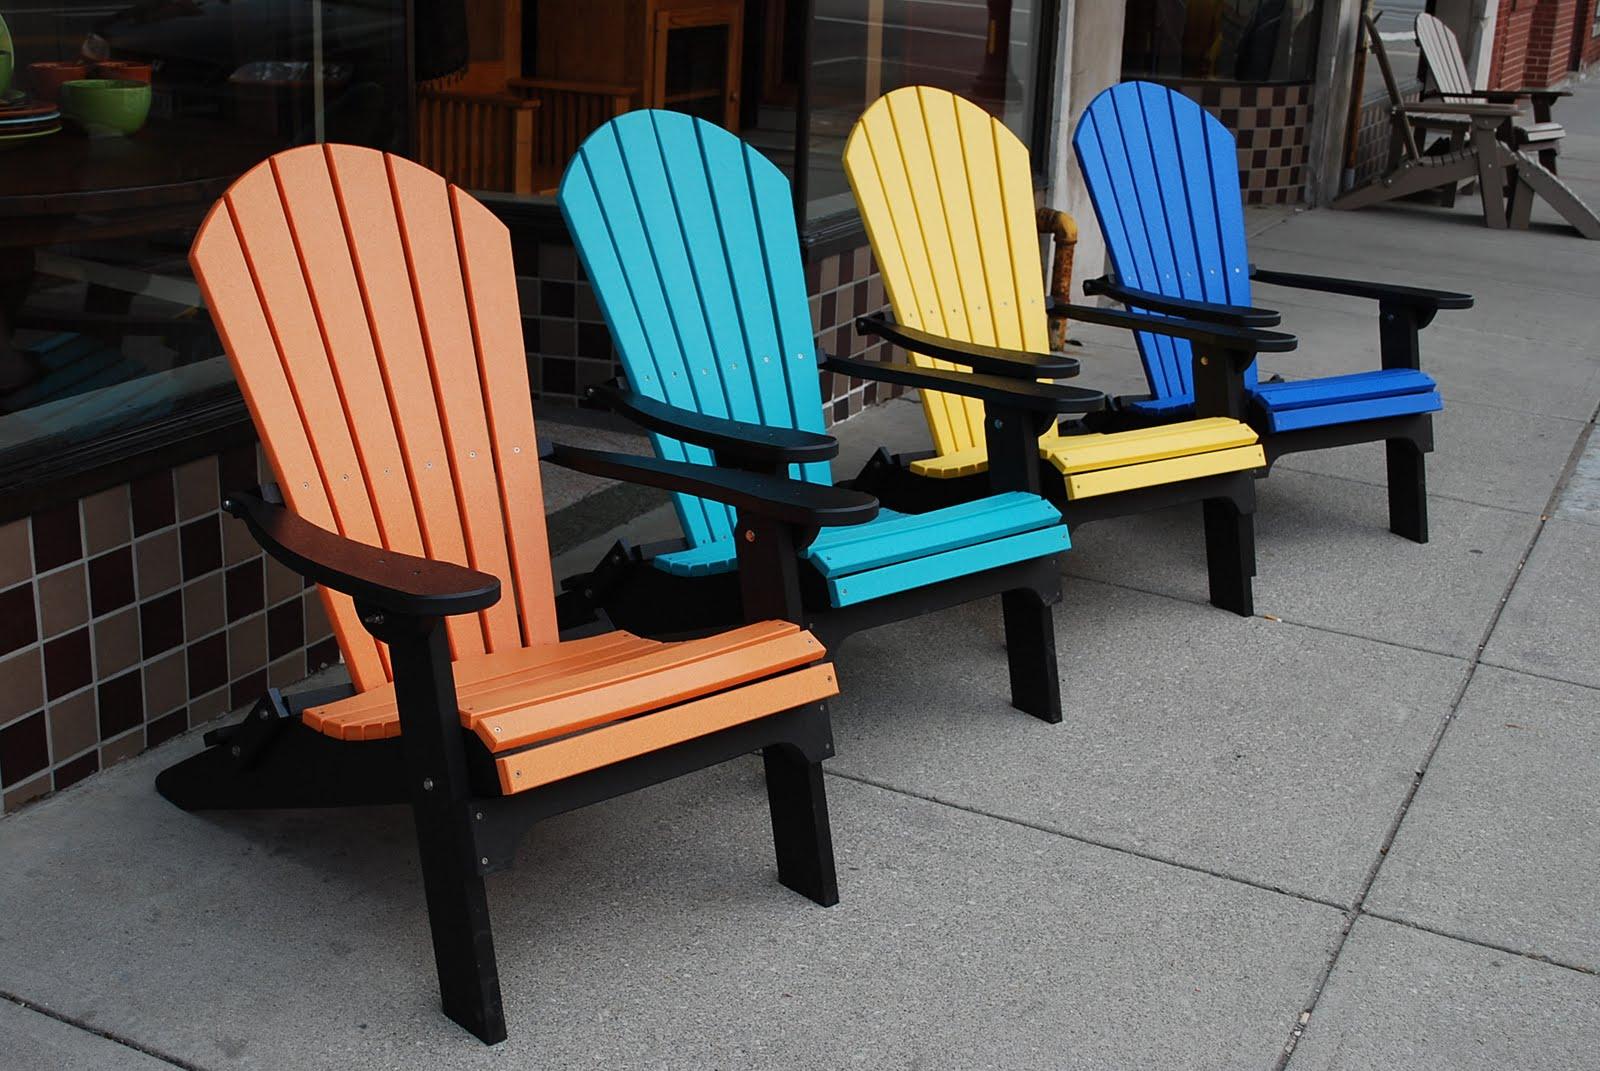 Amish Originals Furniture Co April 2010